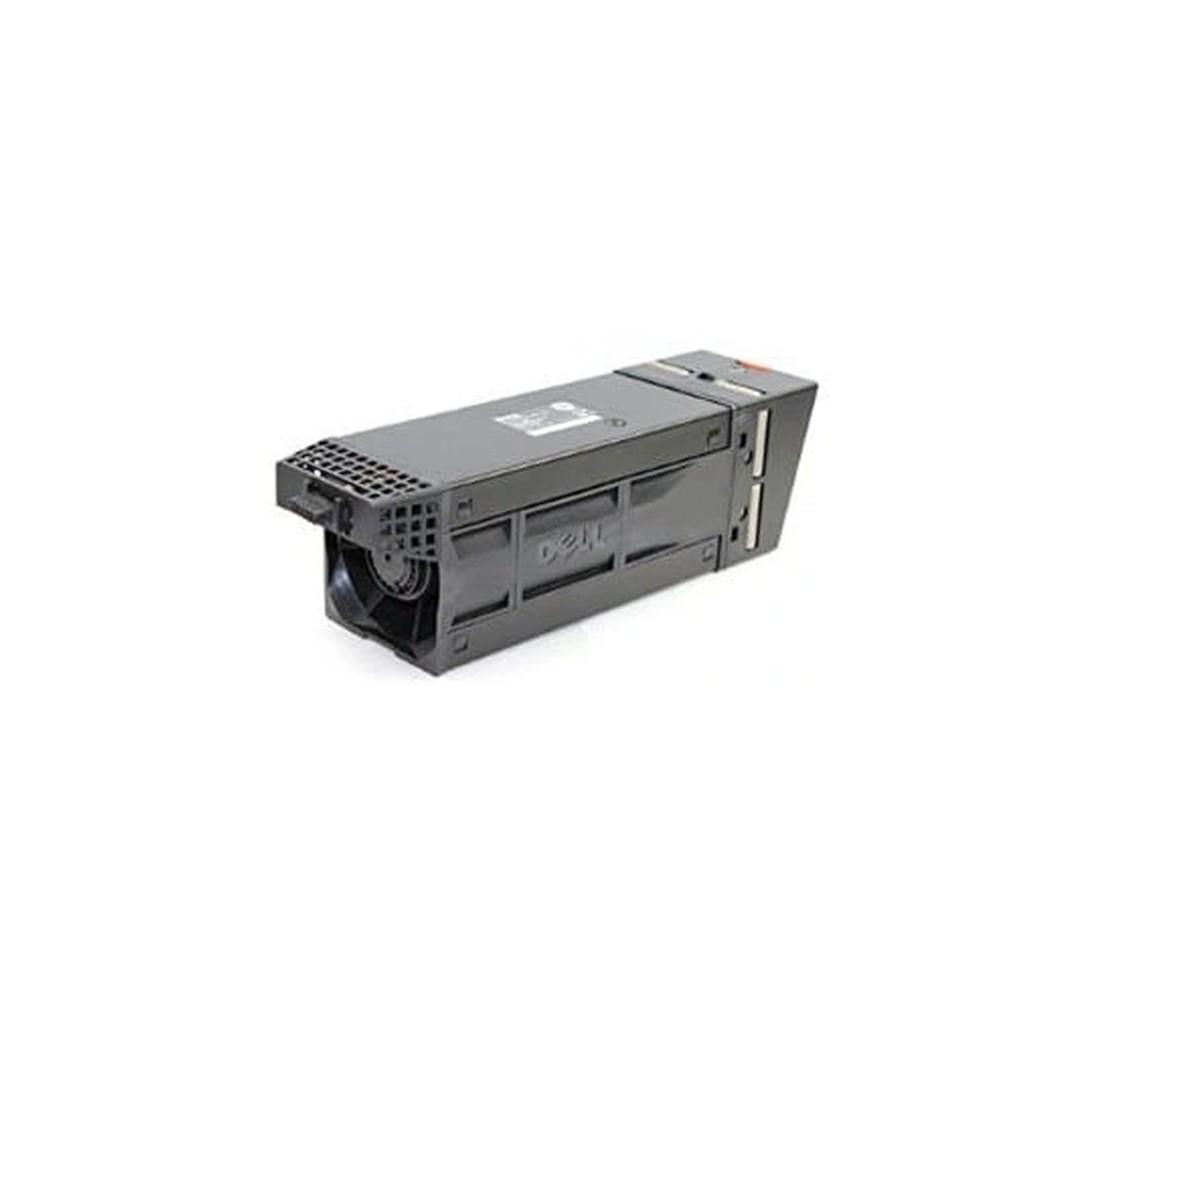 LSI MINI SAS 9207-8e 6Gbps PCIe LOW PROFILE